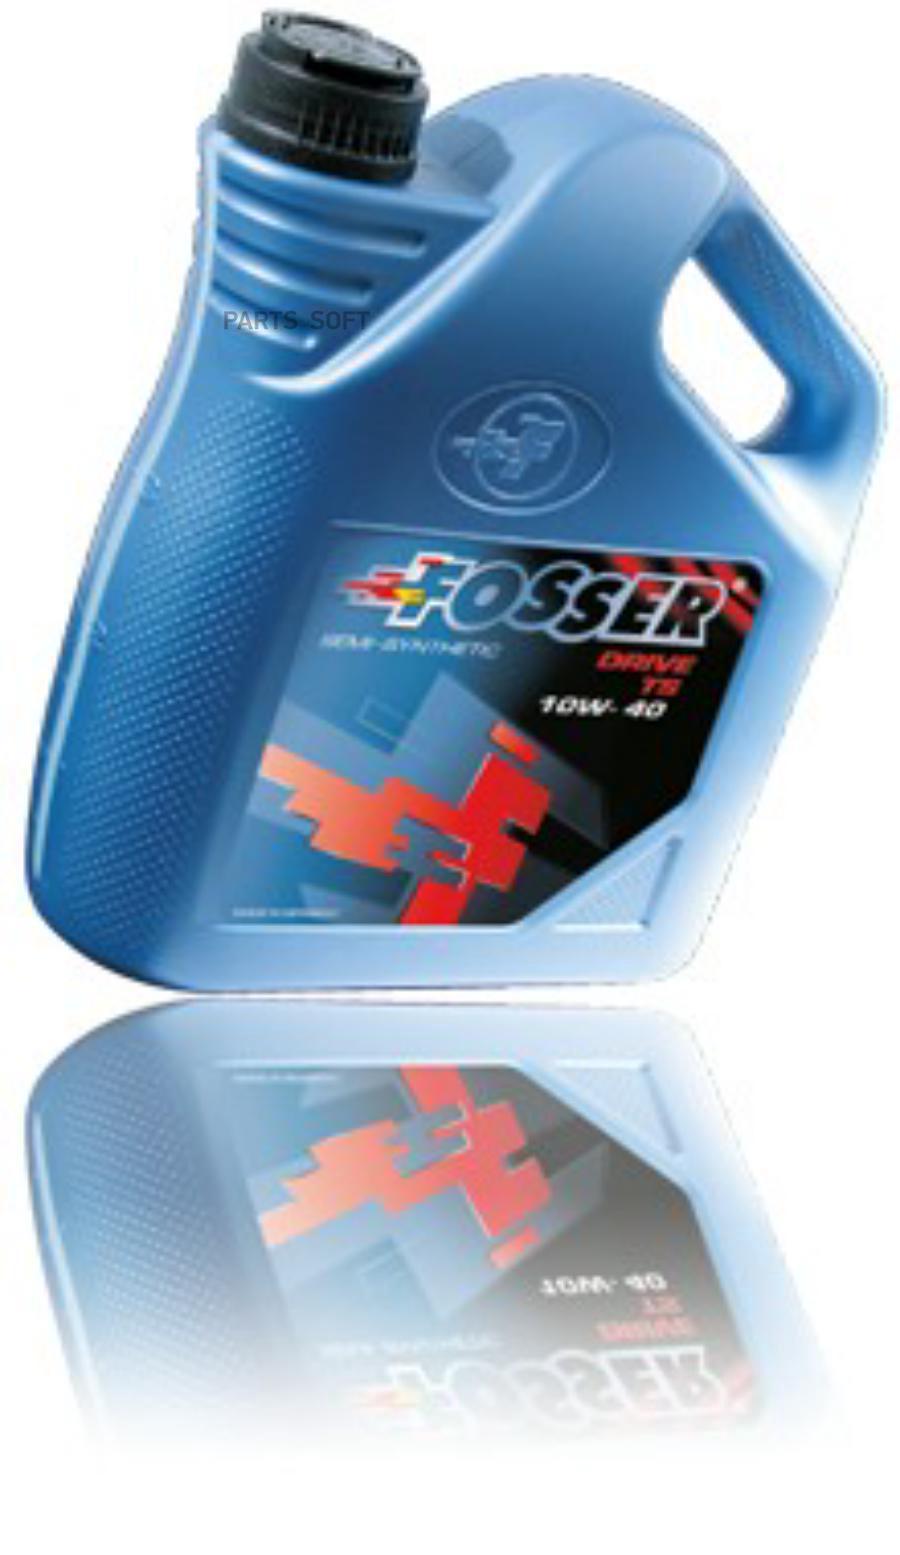 Масло моторное Fosser Drive TS 10W-40 (4л)